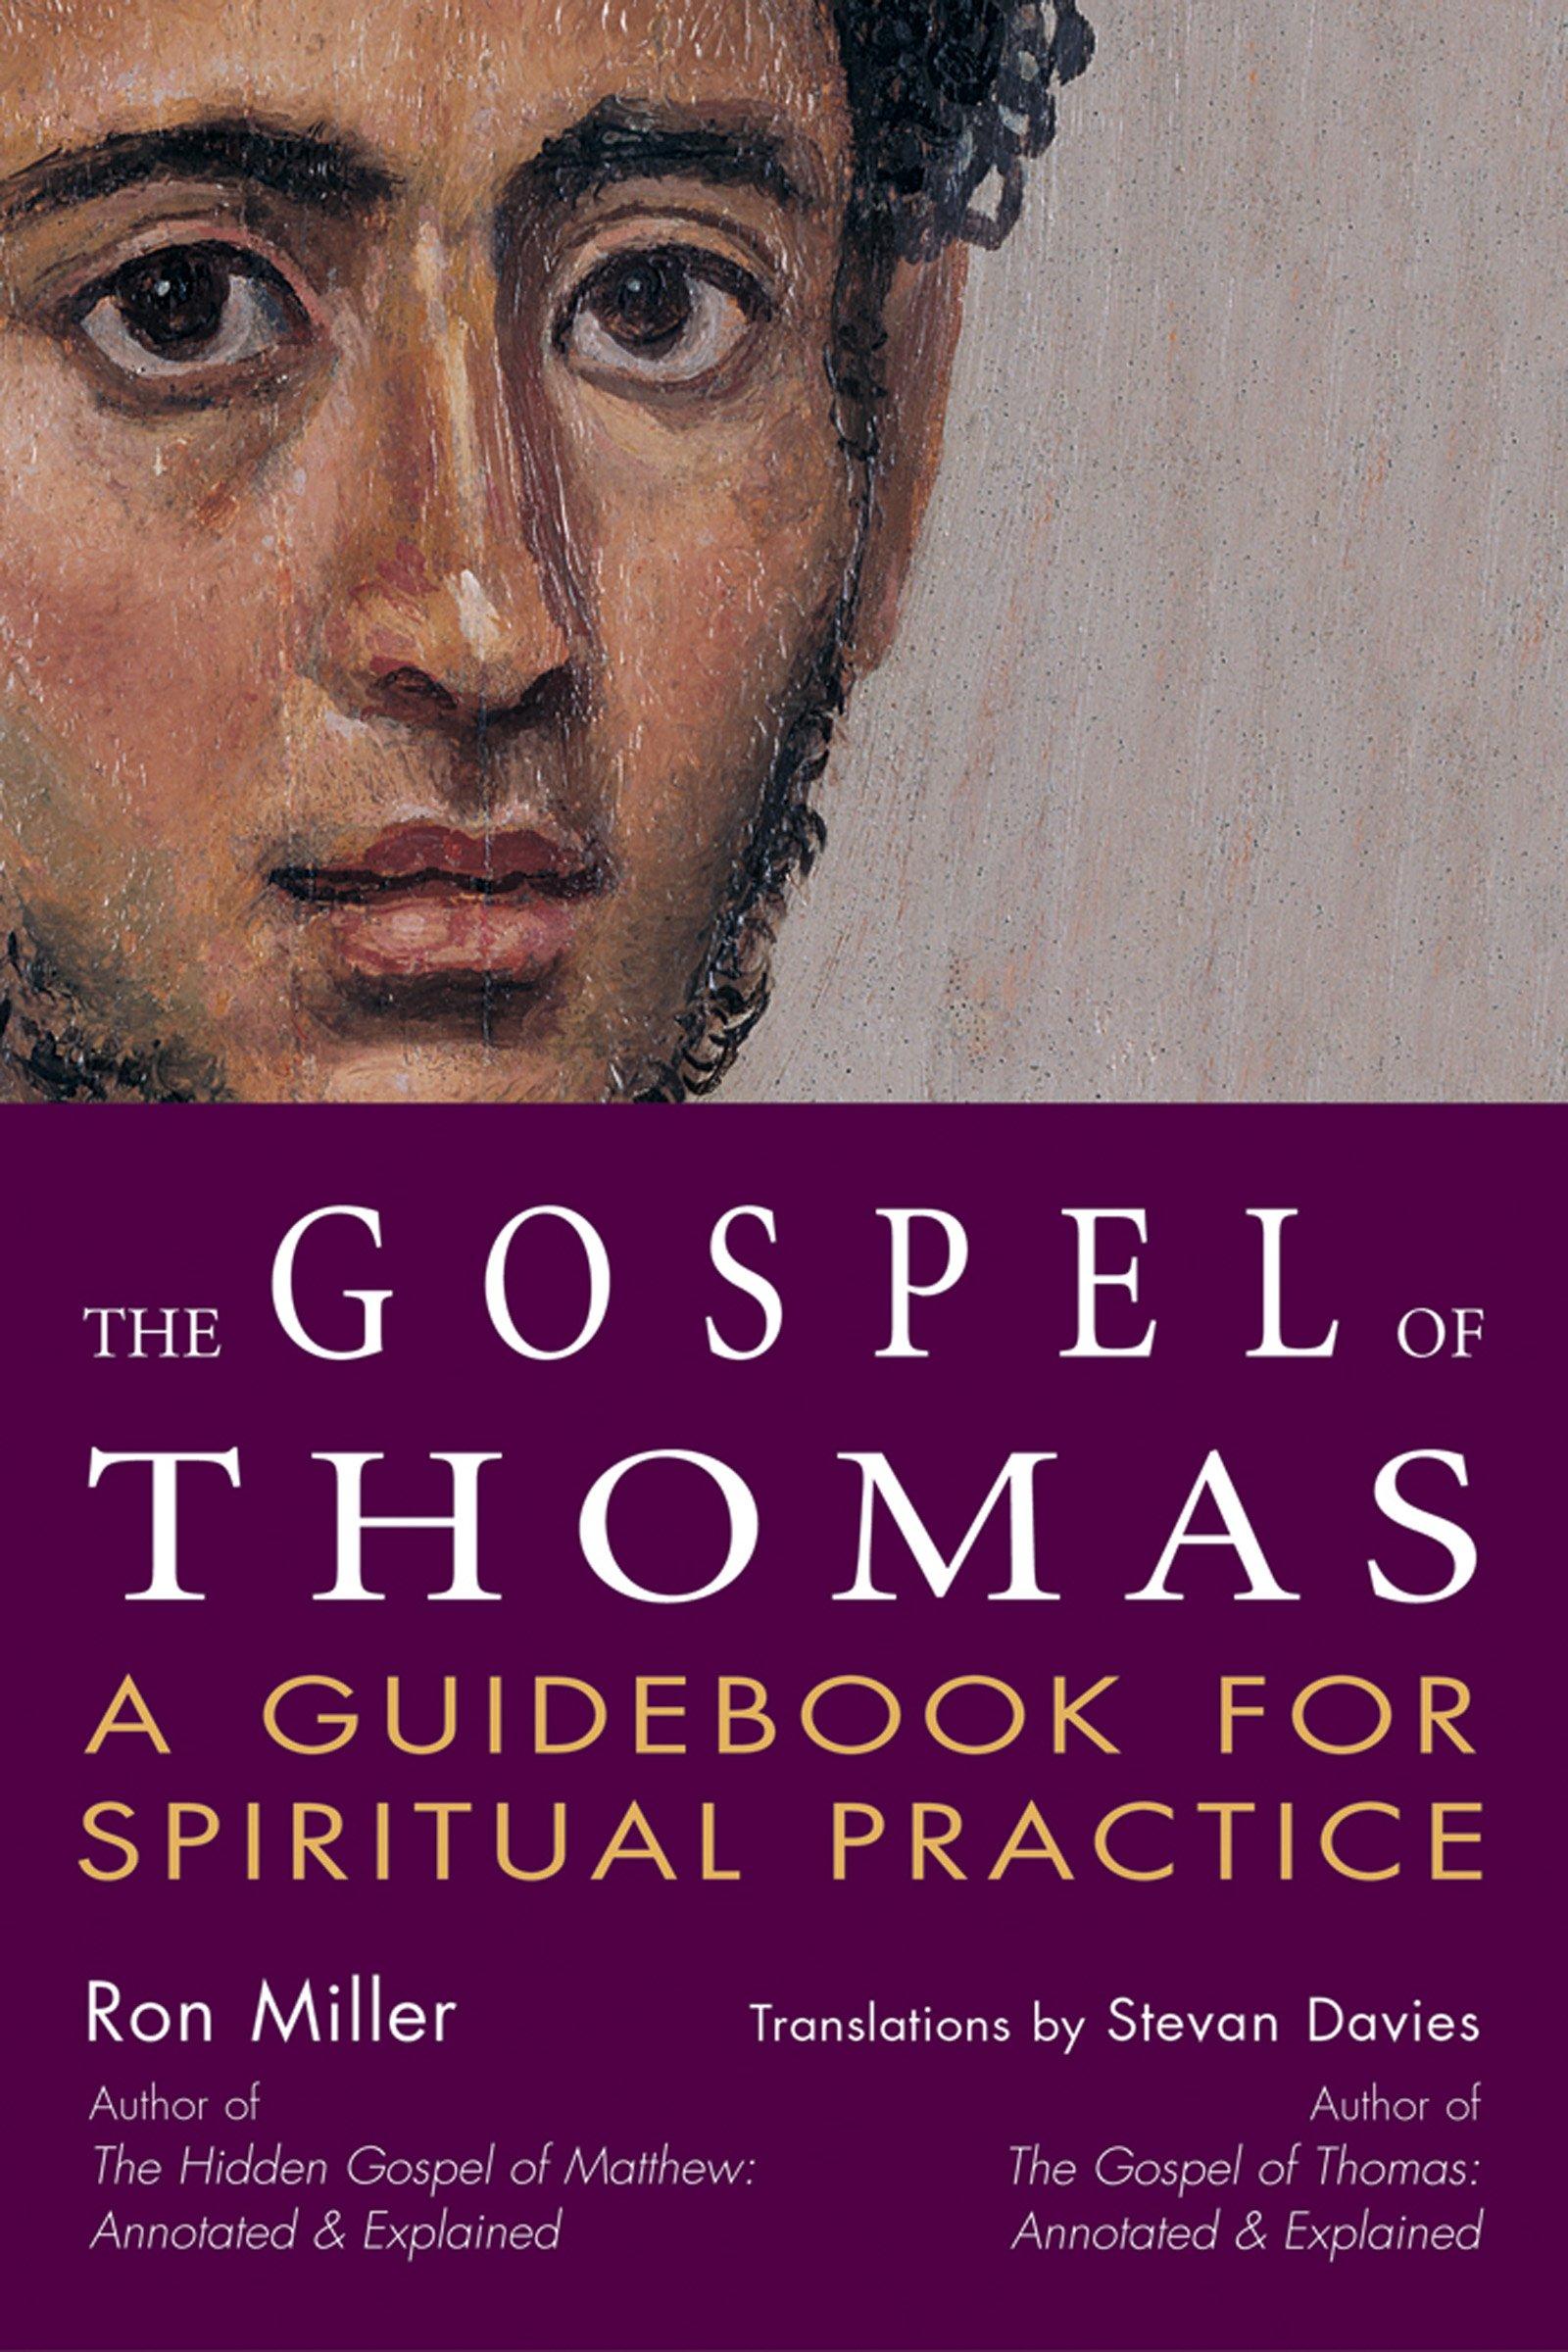 The Gospel of Thomas: A Guidebook for Spiritual Practice ...